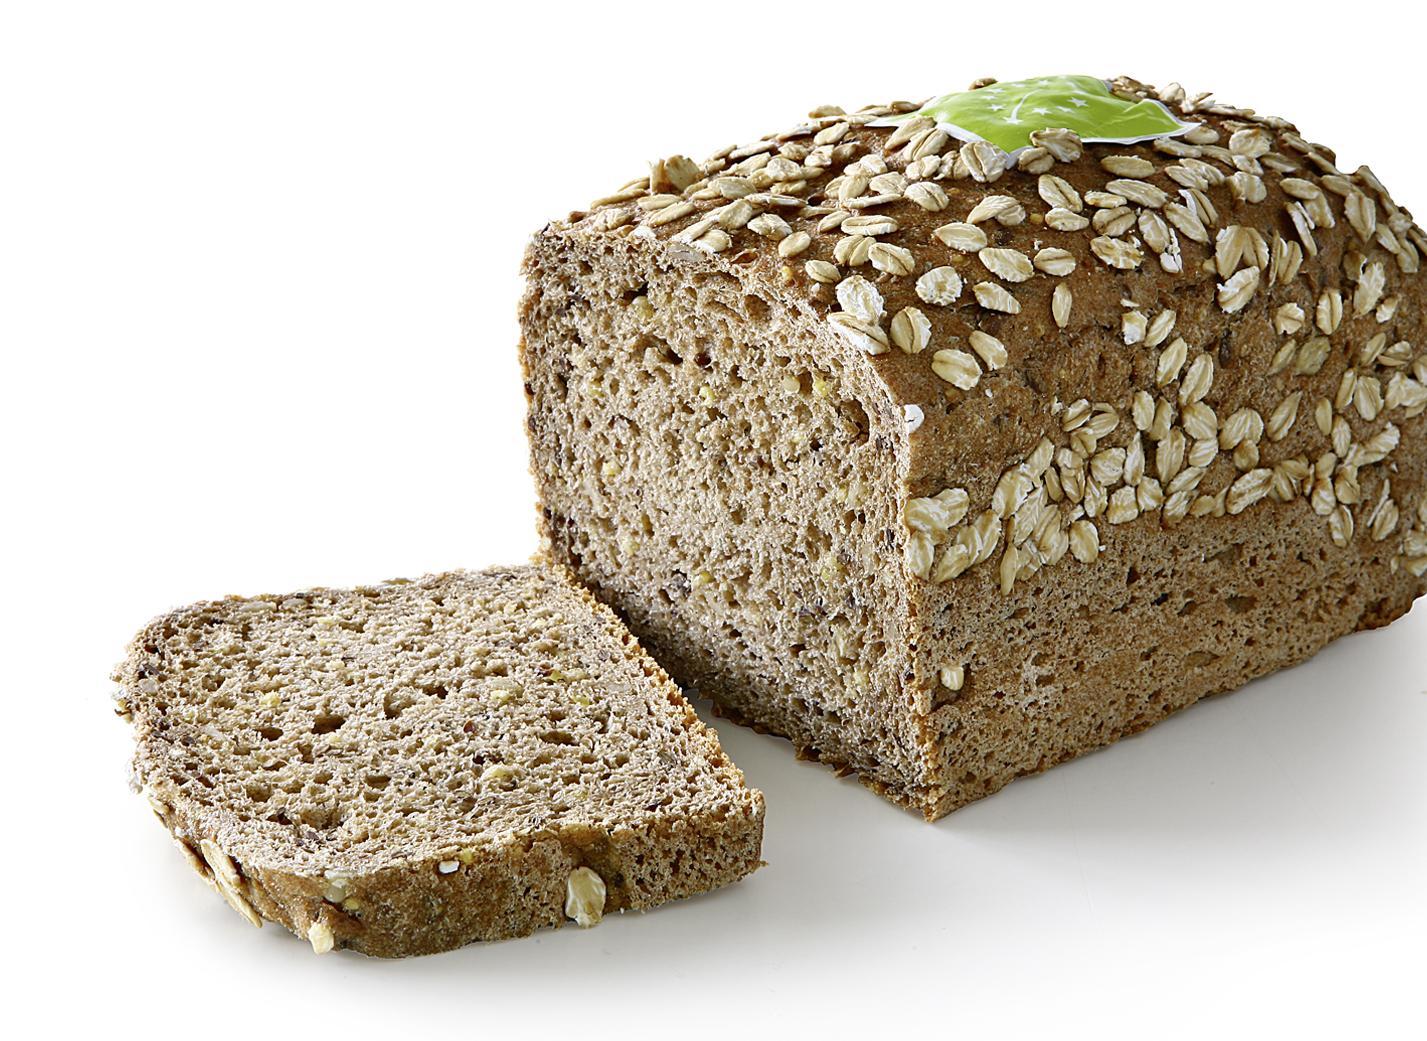 Organic Multi Grain Bread DE-ÖKO-006 - ORGANIC Multigrain Bread with nature sourdough, ORGANIC oat flakes, ORGANIC millet, ORGANIC sunflower kernels and ORGANIC linseed.